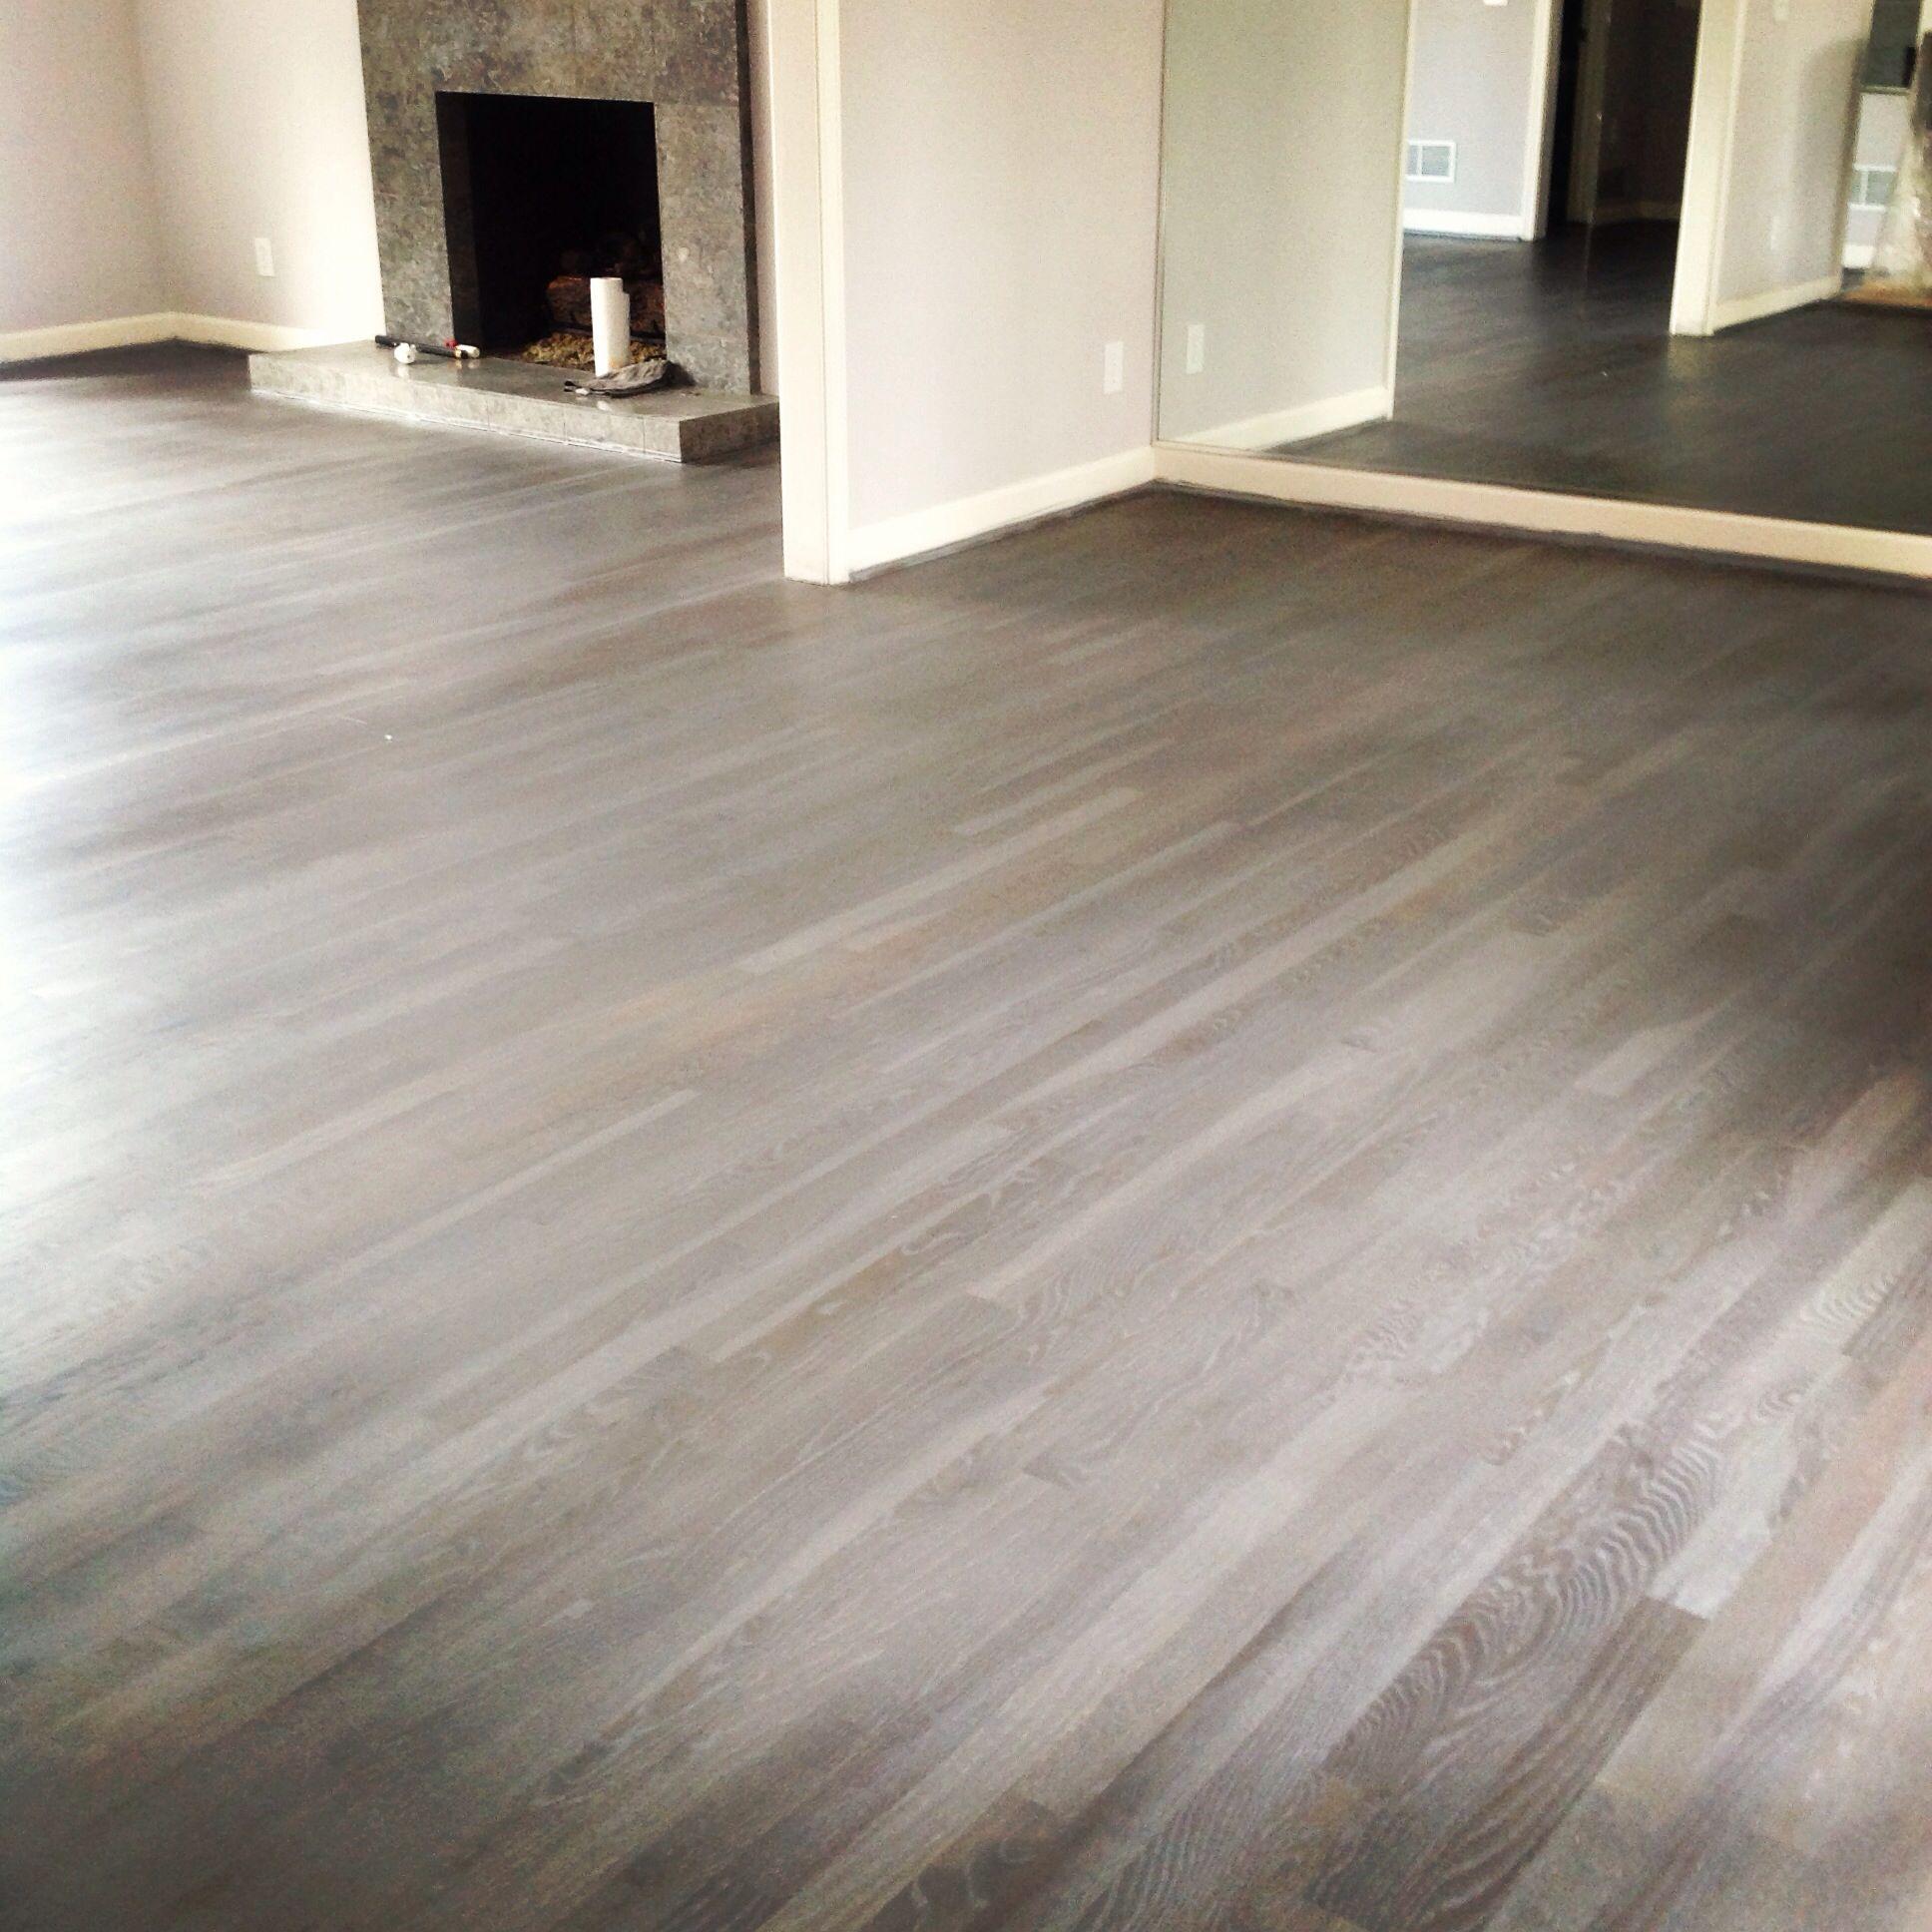 oak floor refinishing oak wood floor the benefits of using it oak floor refinishing oak wood floor the benefits of using it floor design